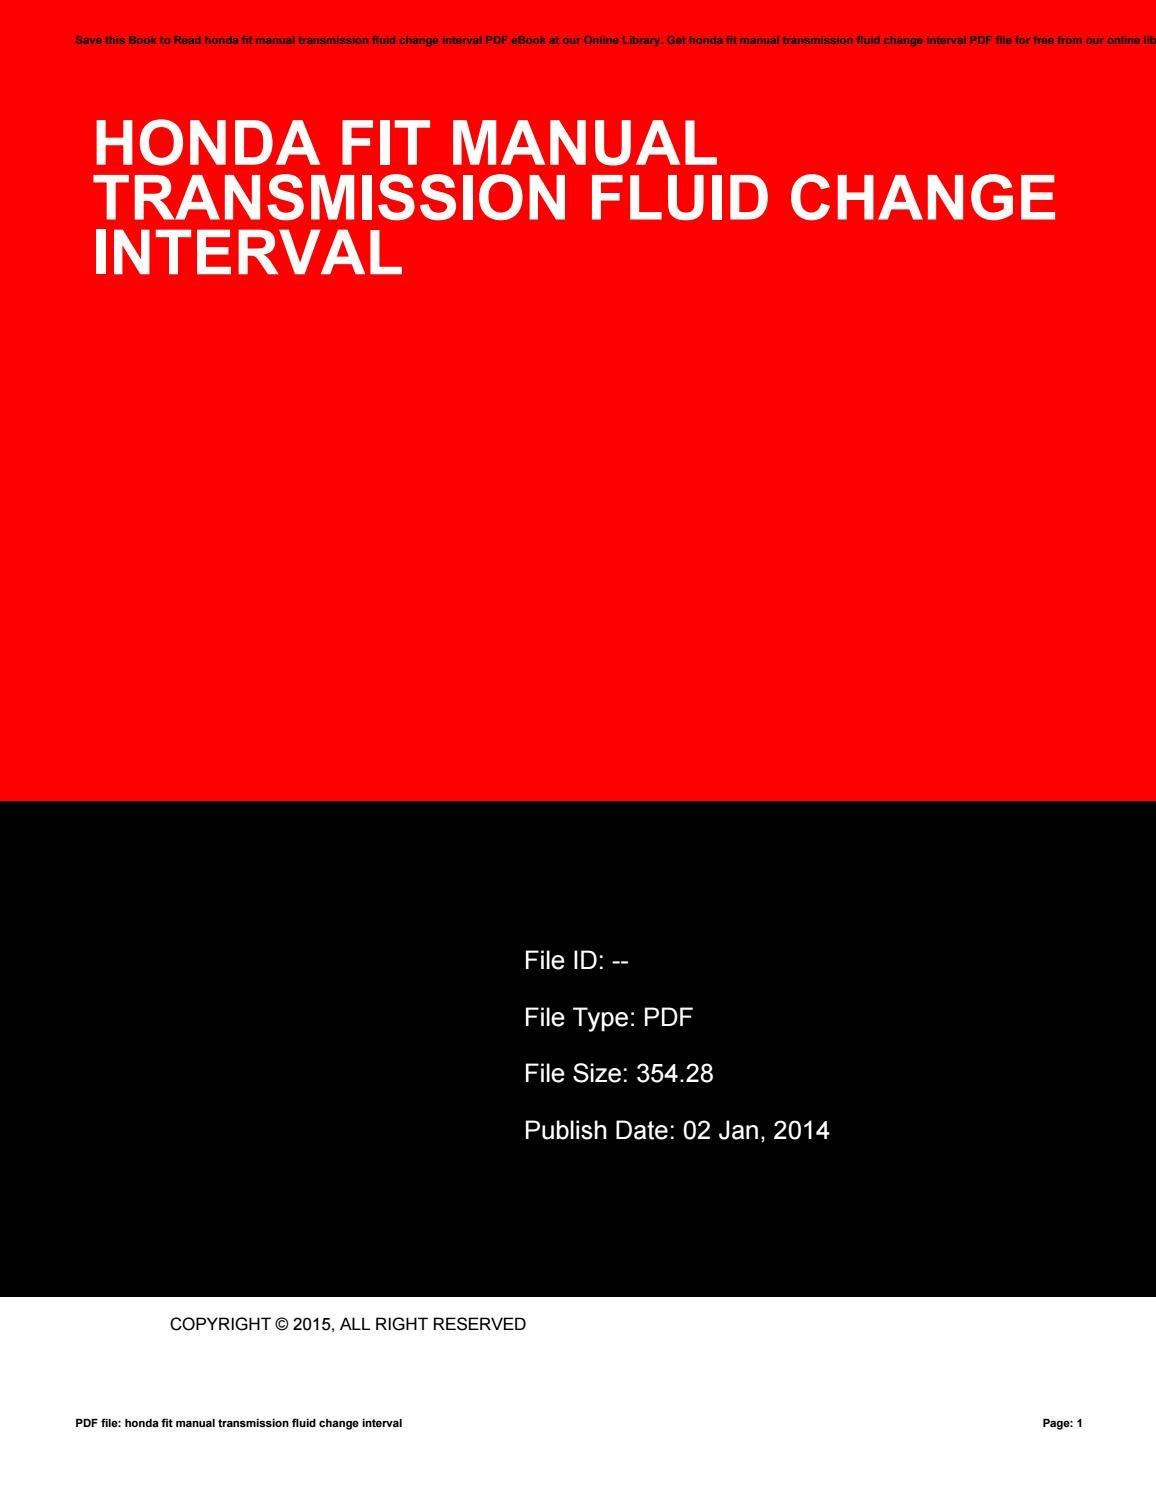 Honda fit manual transmission fluid change interval by harvard-ac-uk158 -  issuu